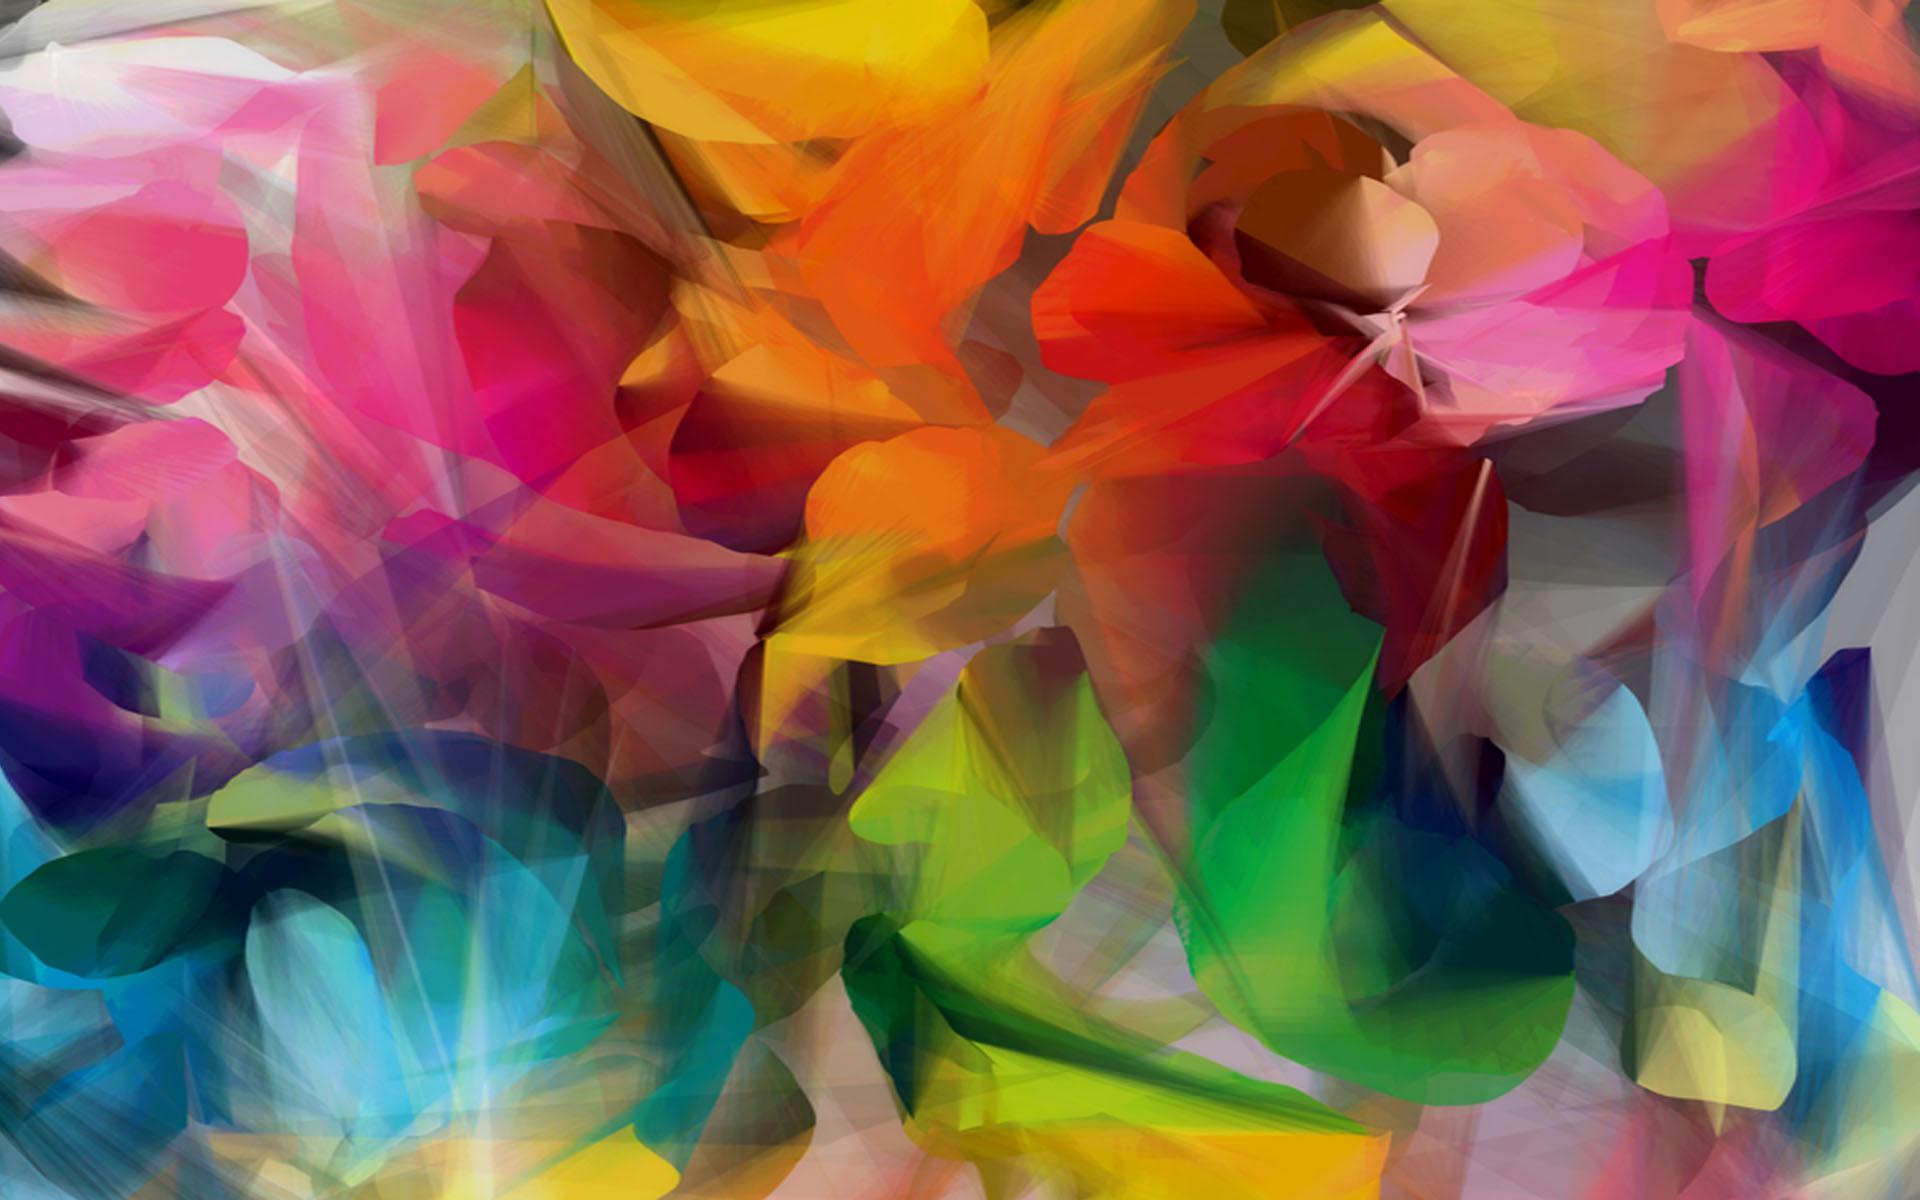 Most Inspiring Wallpaper High Resolution Painting - colorful-art-wallpaper-46190-47522-hd-wallpapers  Snapshot_585819.jpg